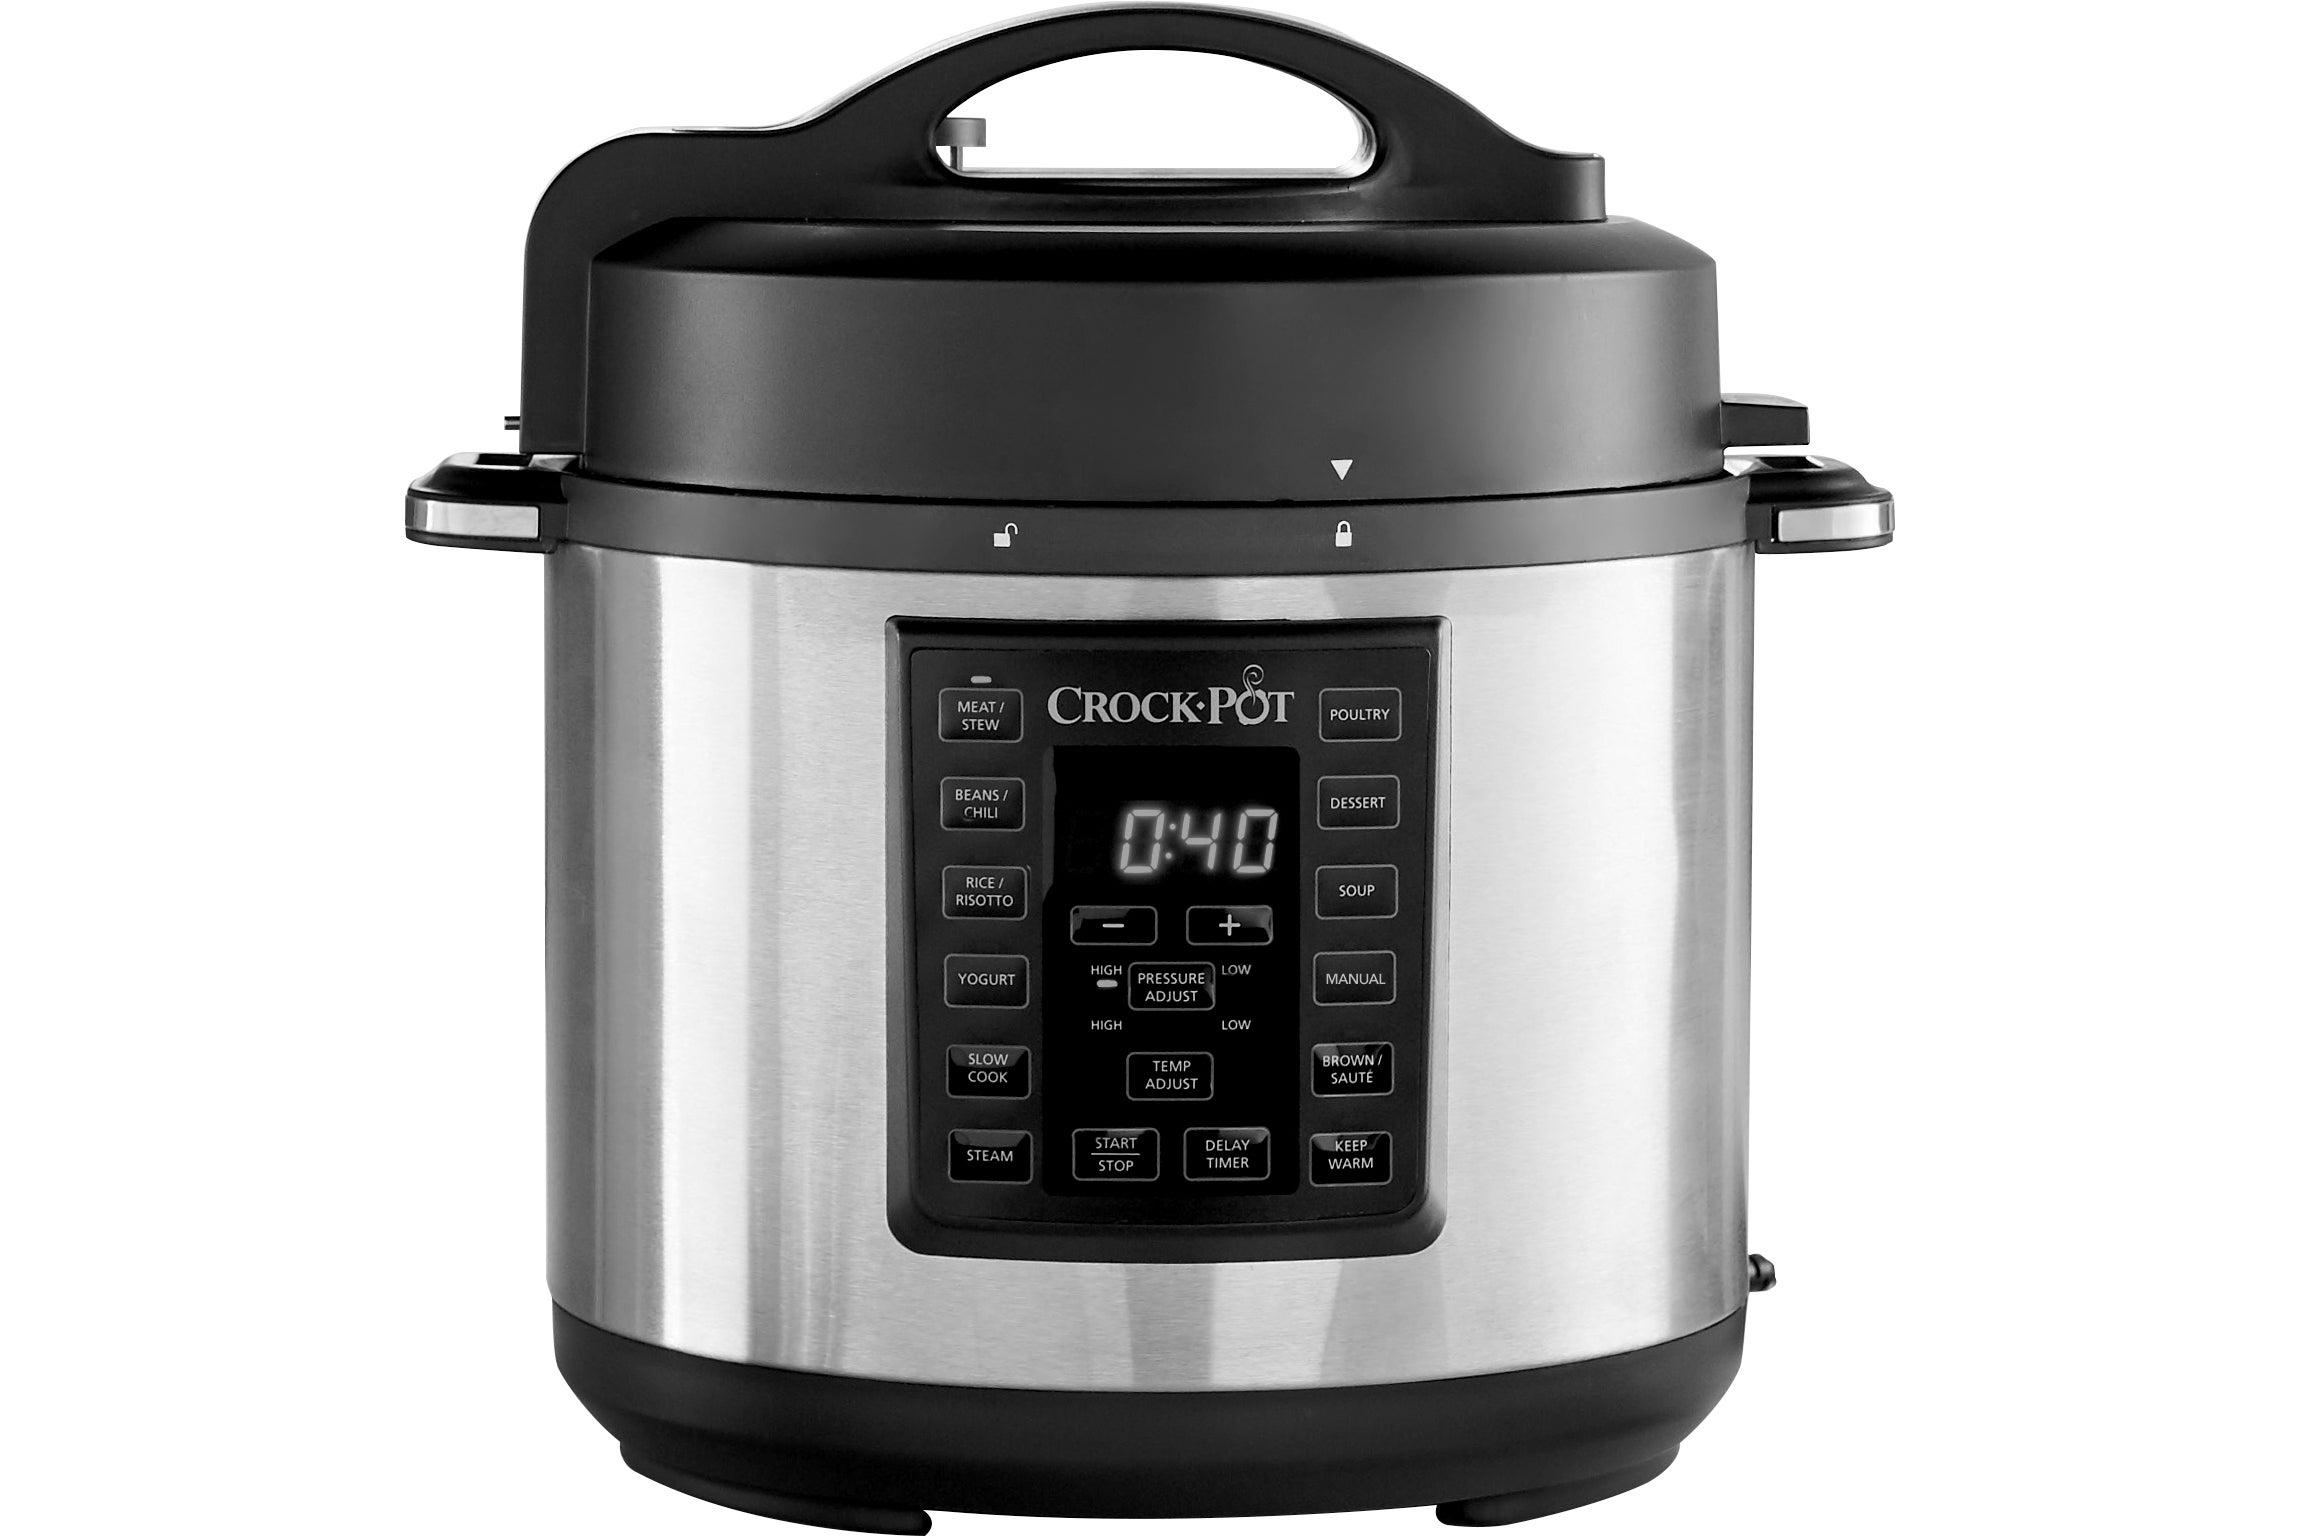 Crock Pot Express Multi Cooker Csc051 Review